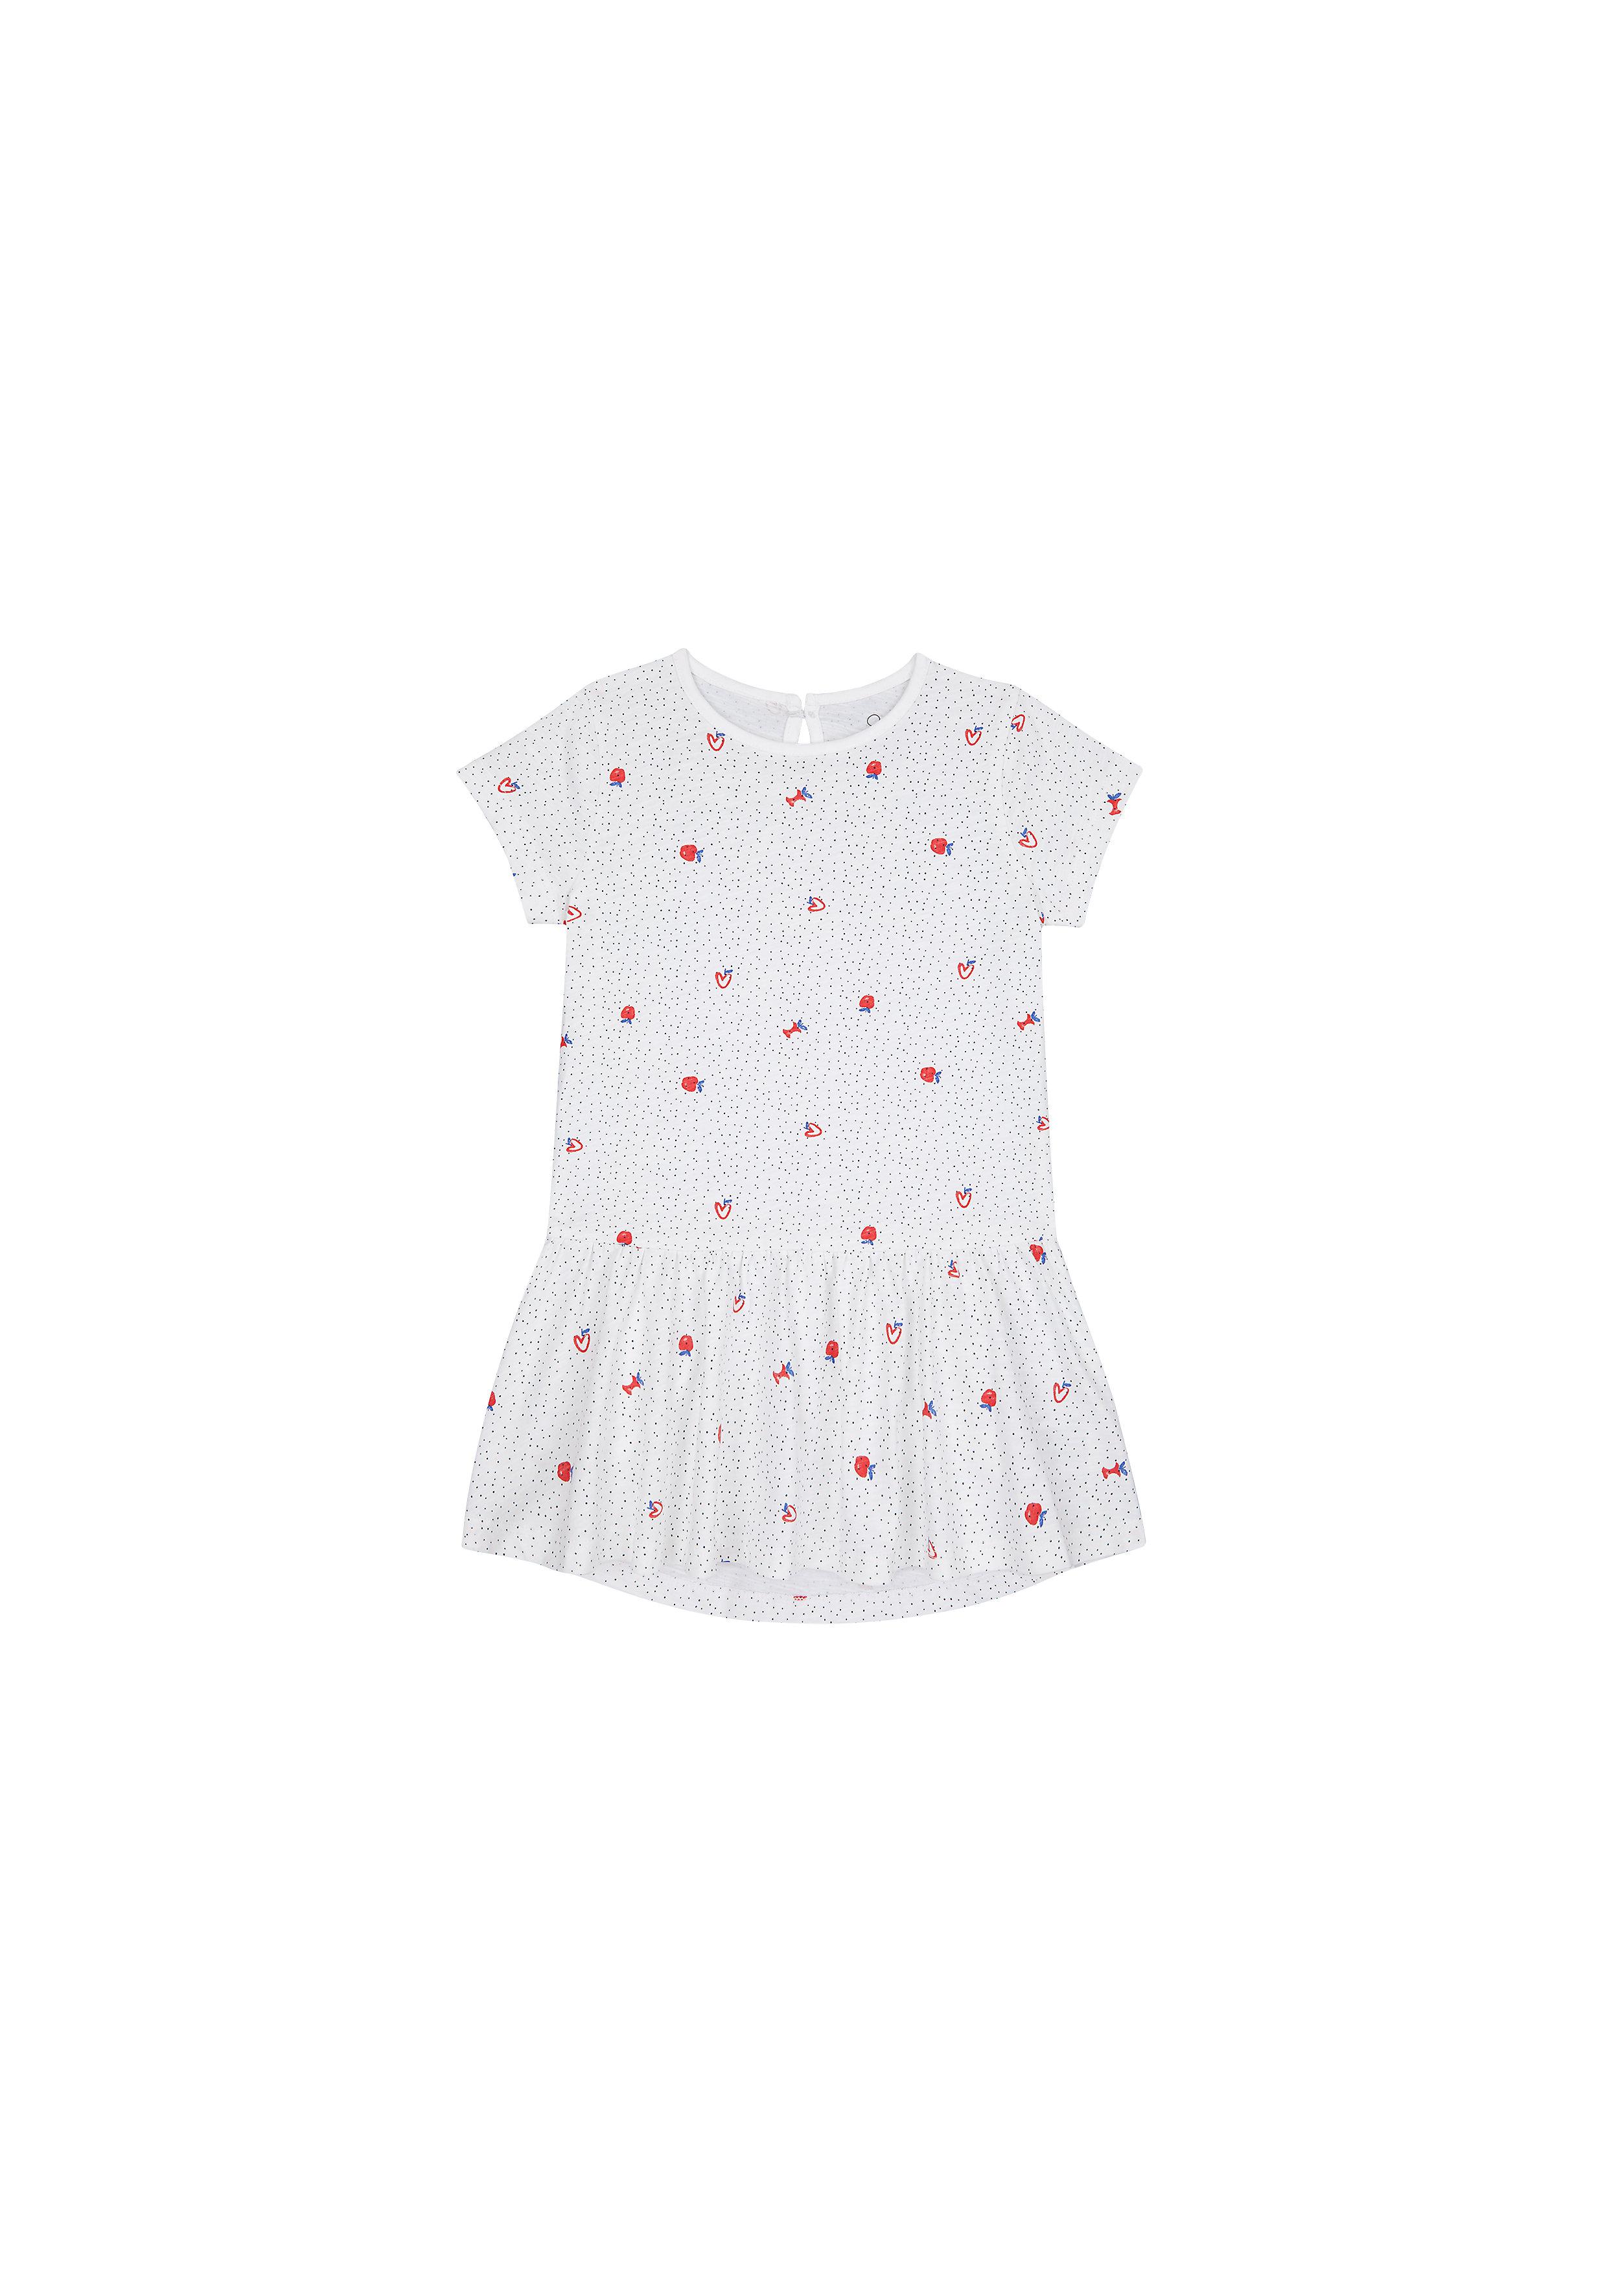 Mothercare | Girls Half Sleeves Dress Apple Print - White